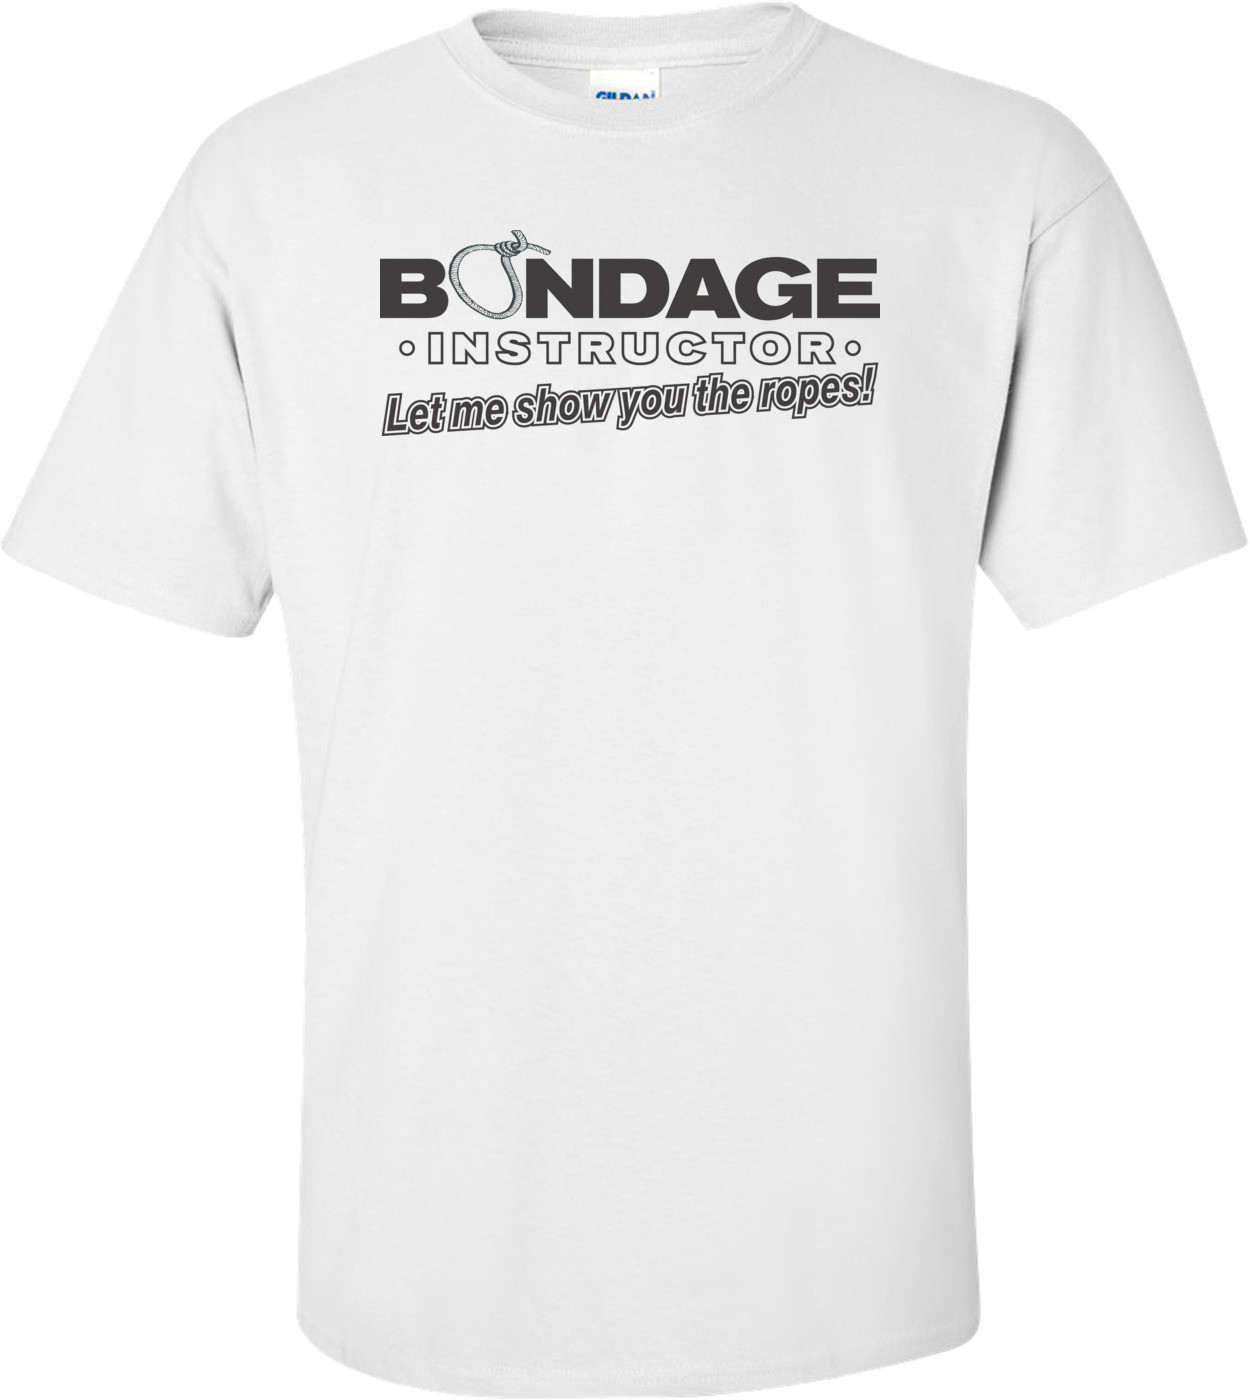 Bondage Instructor I'll Teach You The Ropes T-shirt